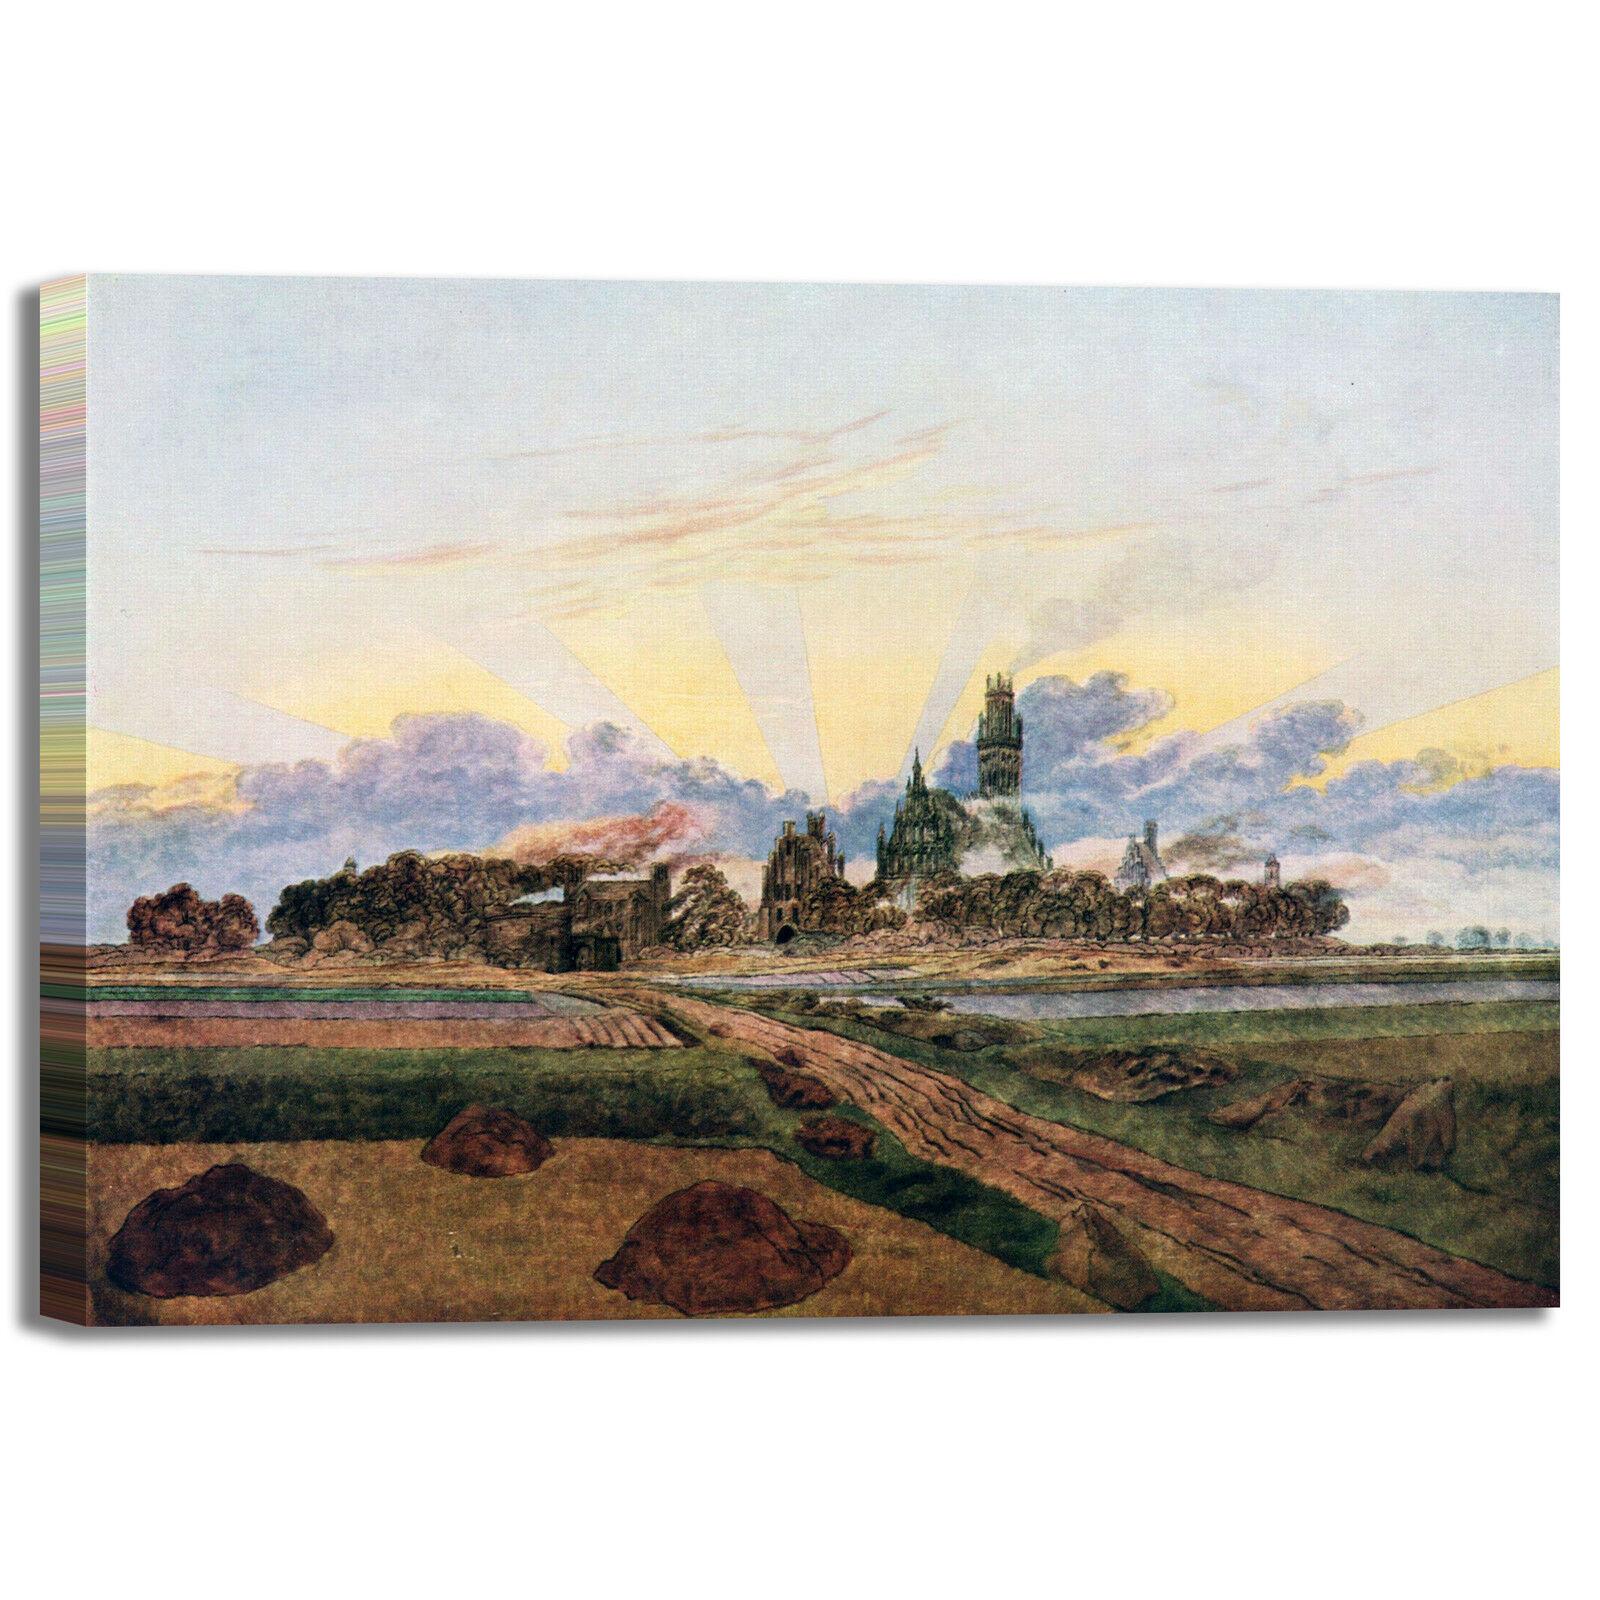 Caspar Neubrandenburg in fiamme quadro stampa tela dipinto telaio arroto casa